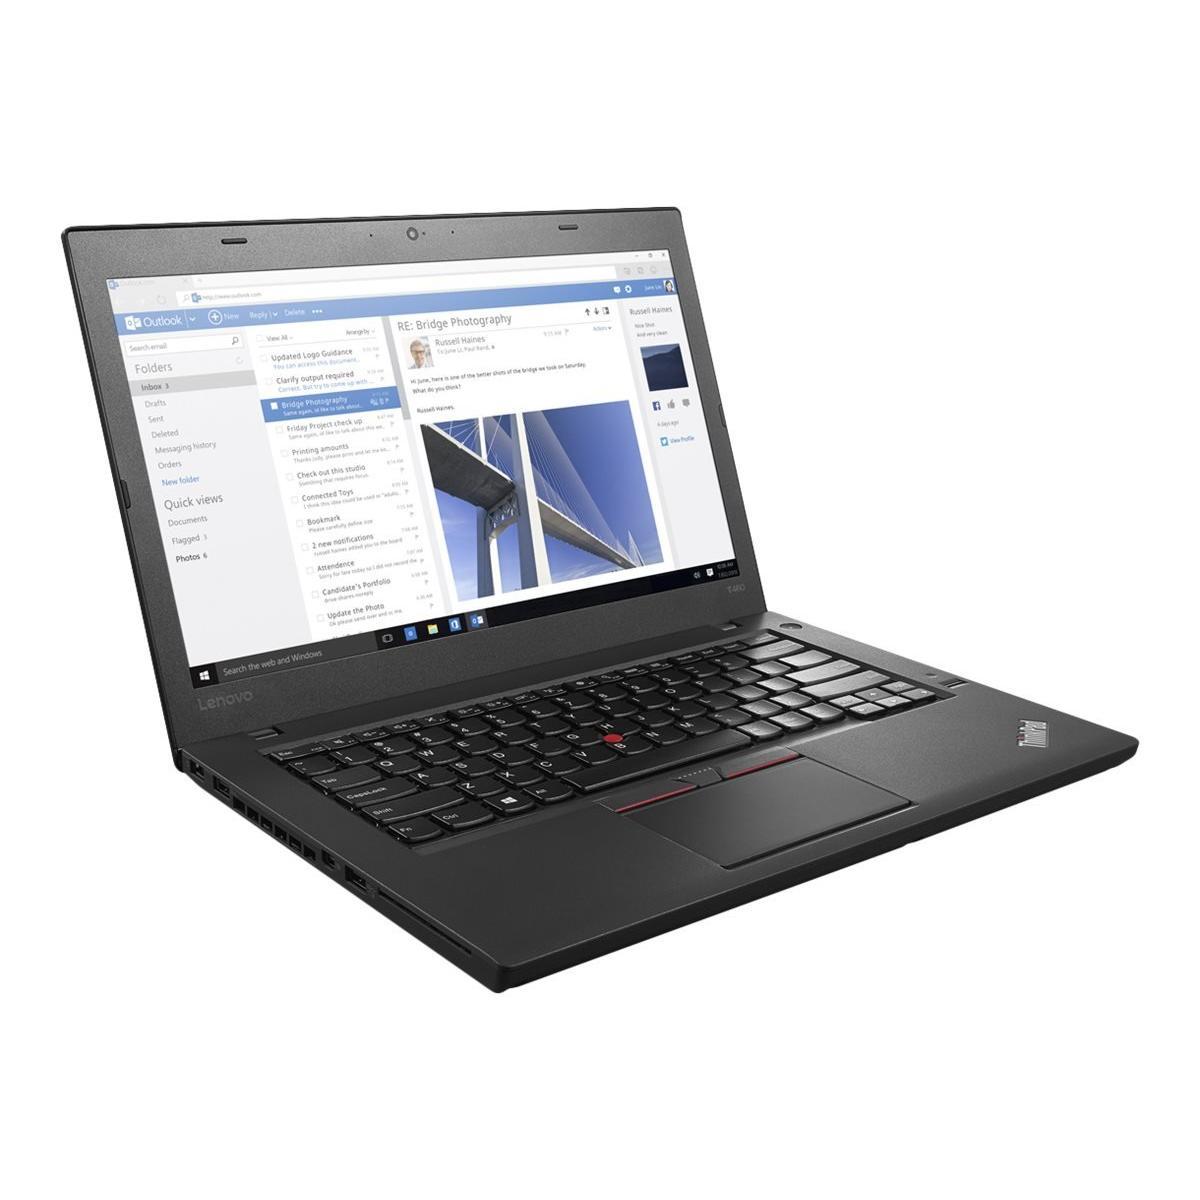 Lenovo Thinkpad T460 14-inch (2015) - Core i5-6300U - 8 GB  - SSD 180 GB